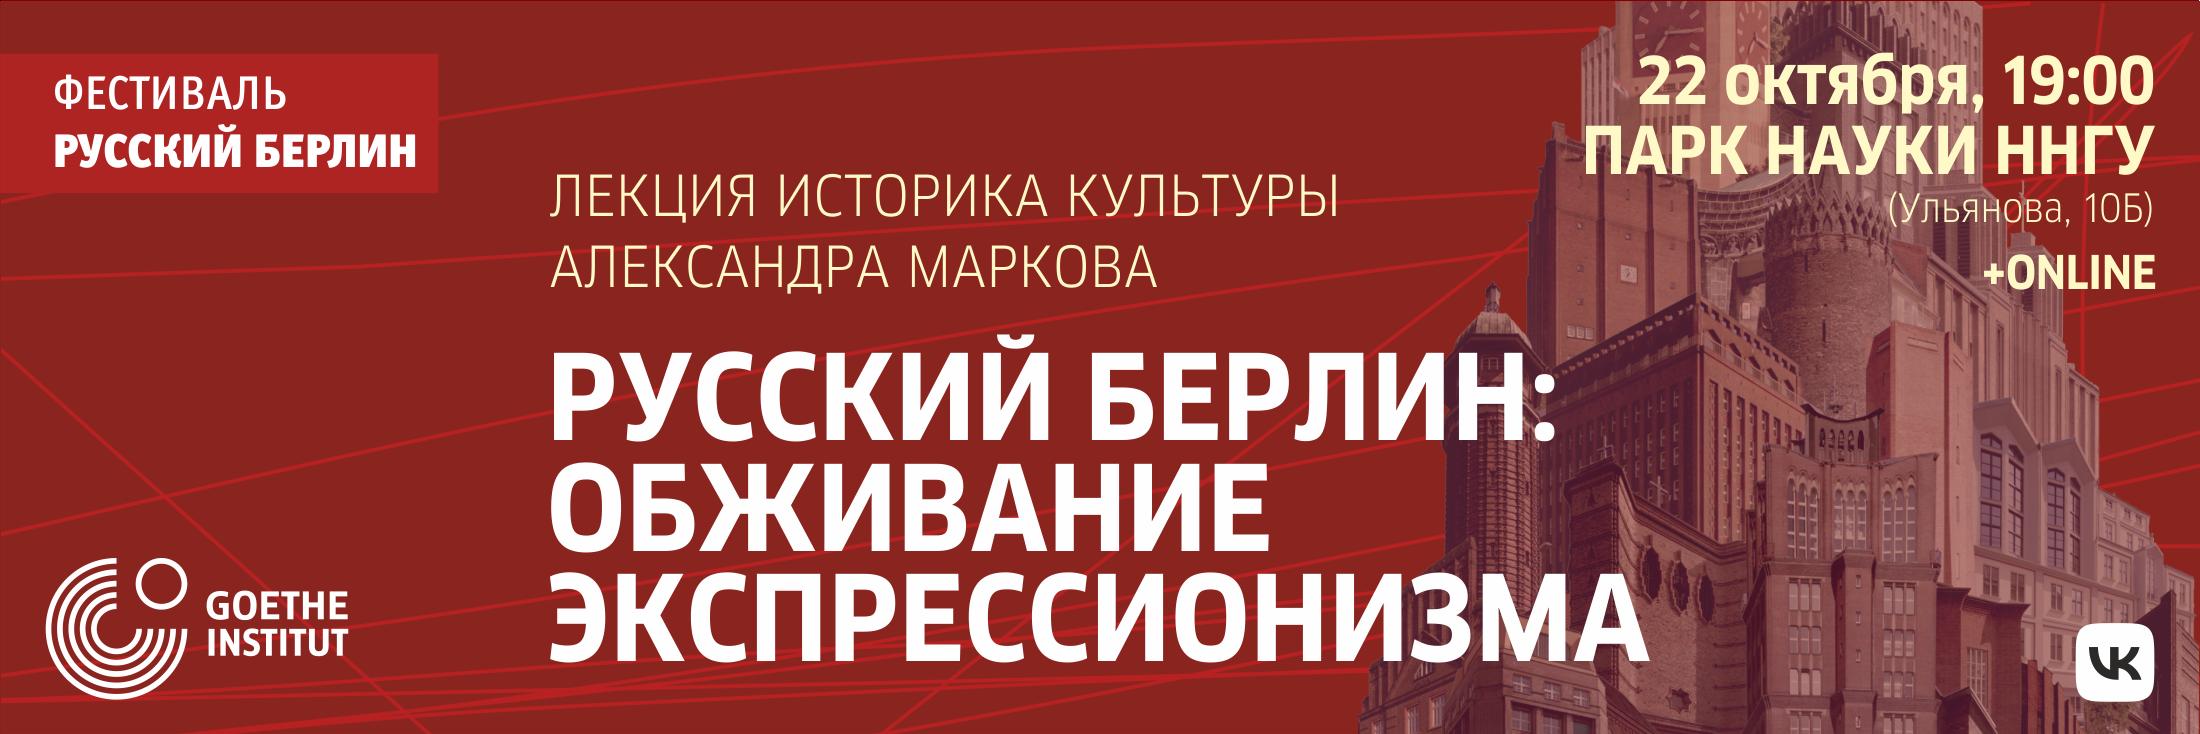 Лекция Александра Маркова «Русский Берлин: обживание экспрессионизма»